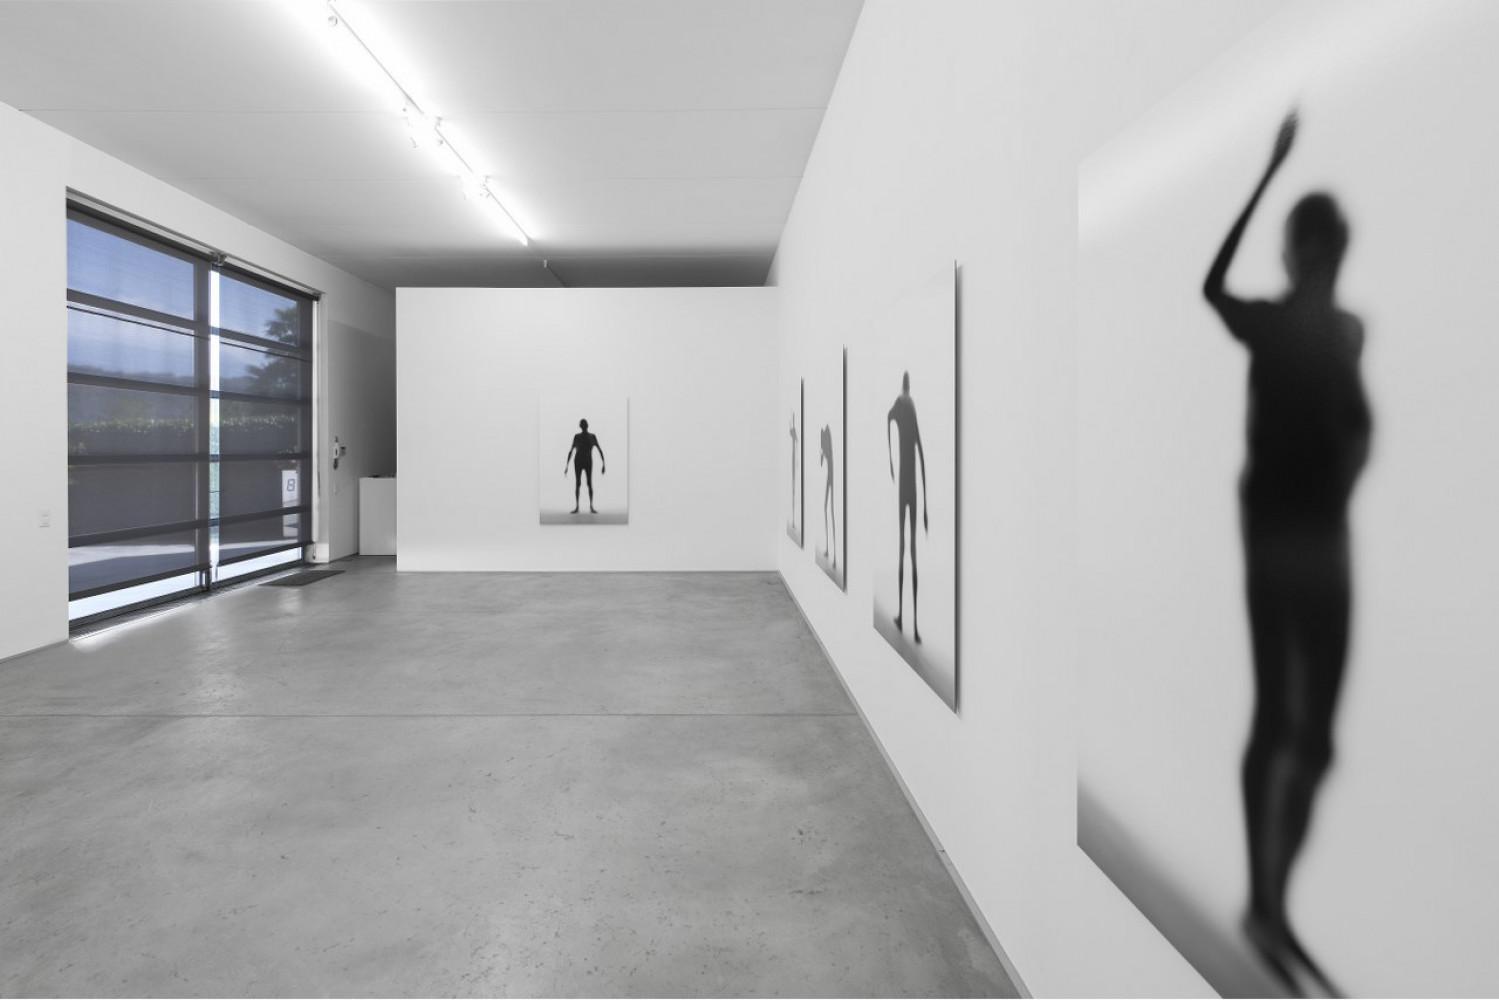 Marco D'Anna, 'Oltre', Installation view, Buchmann Lugano